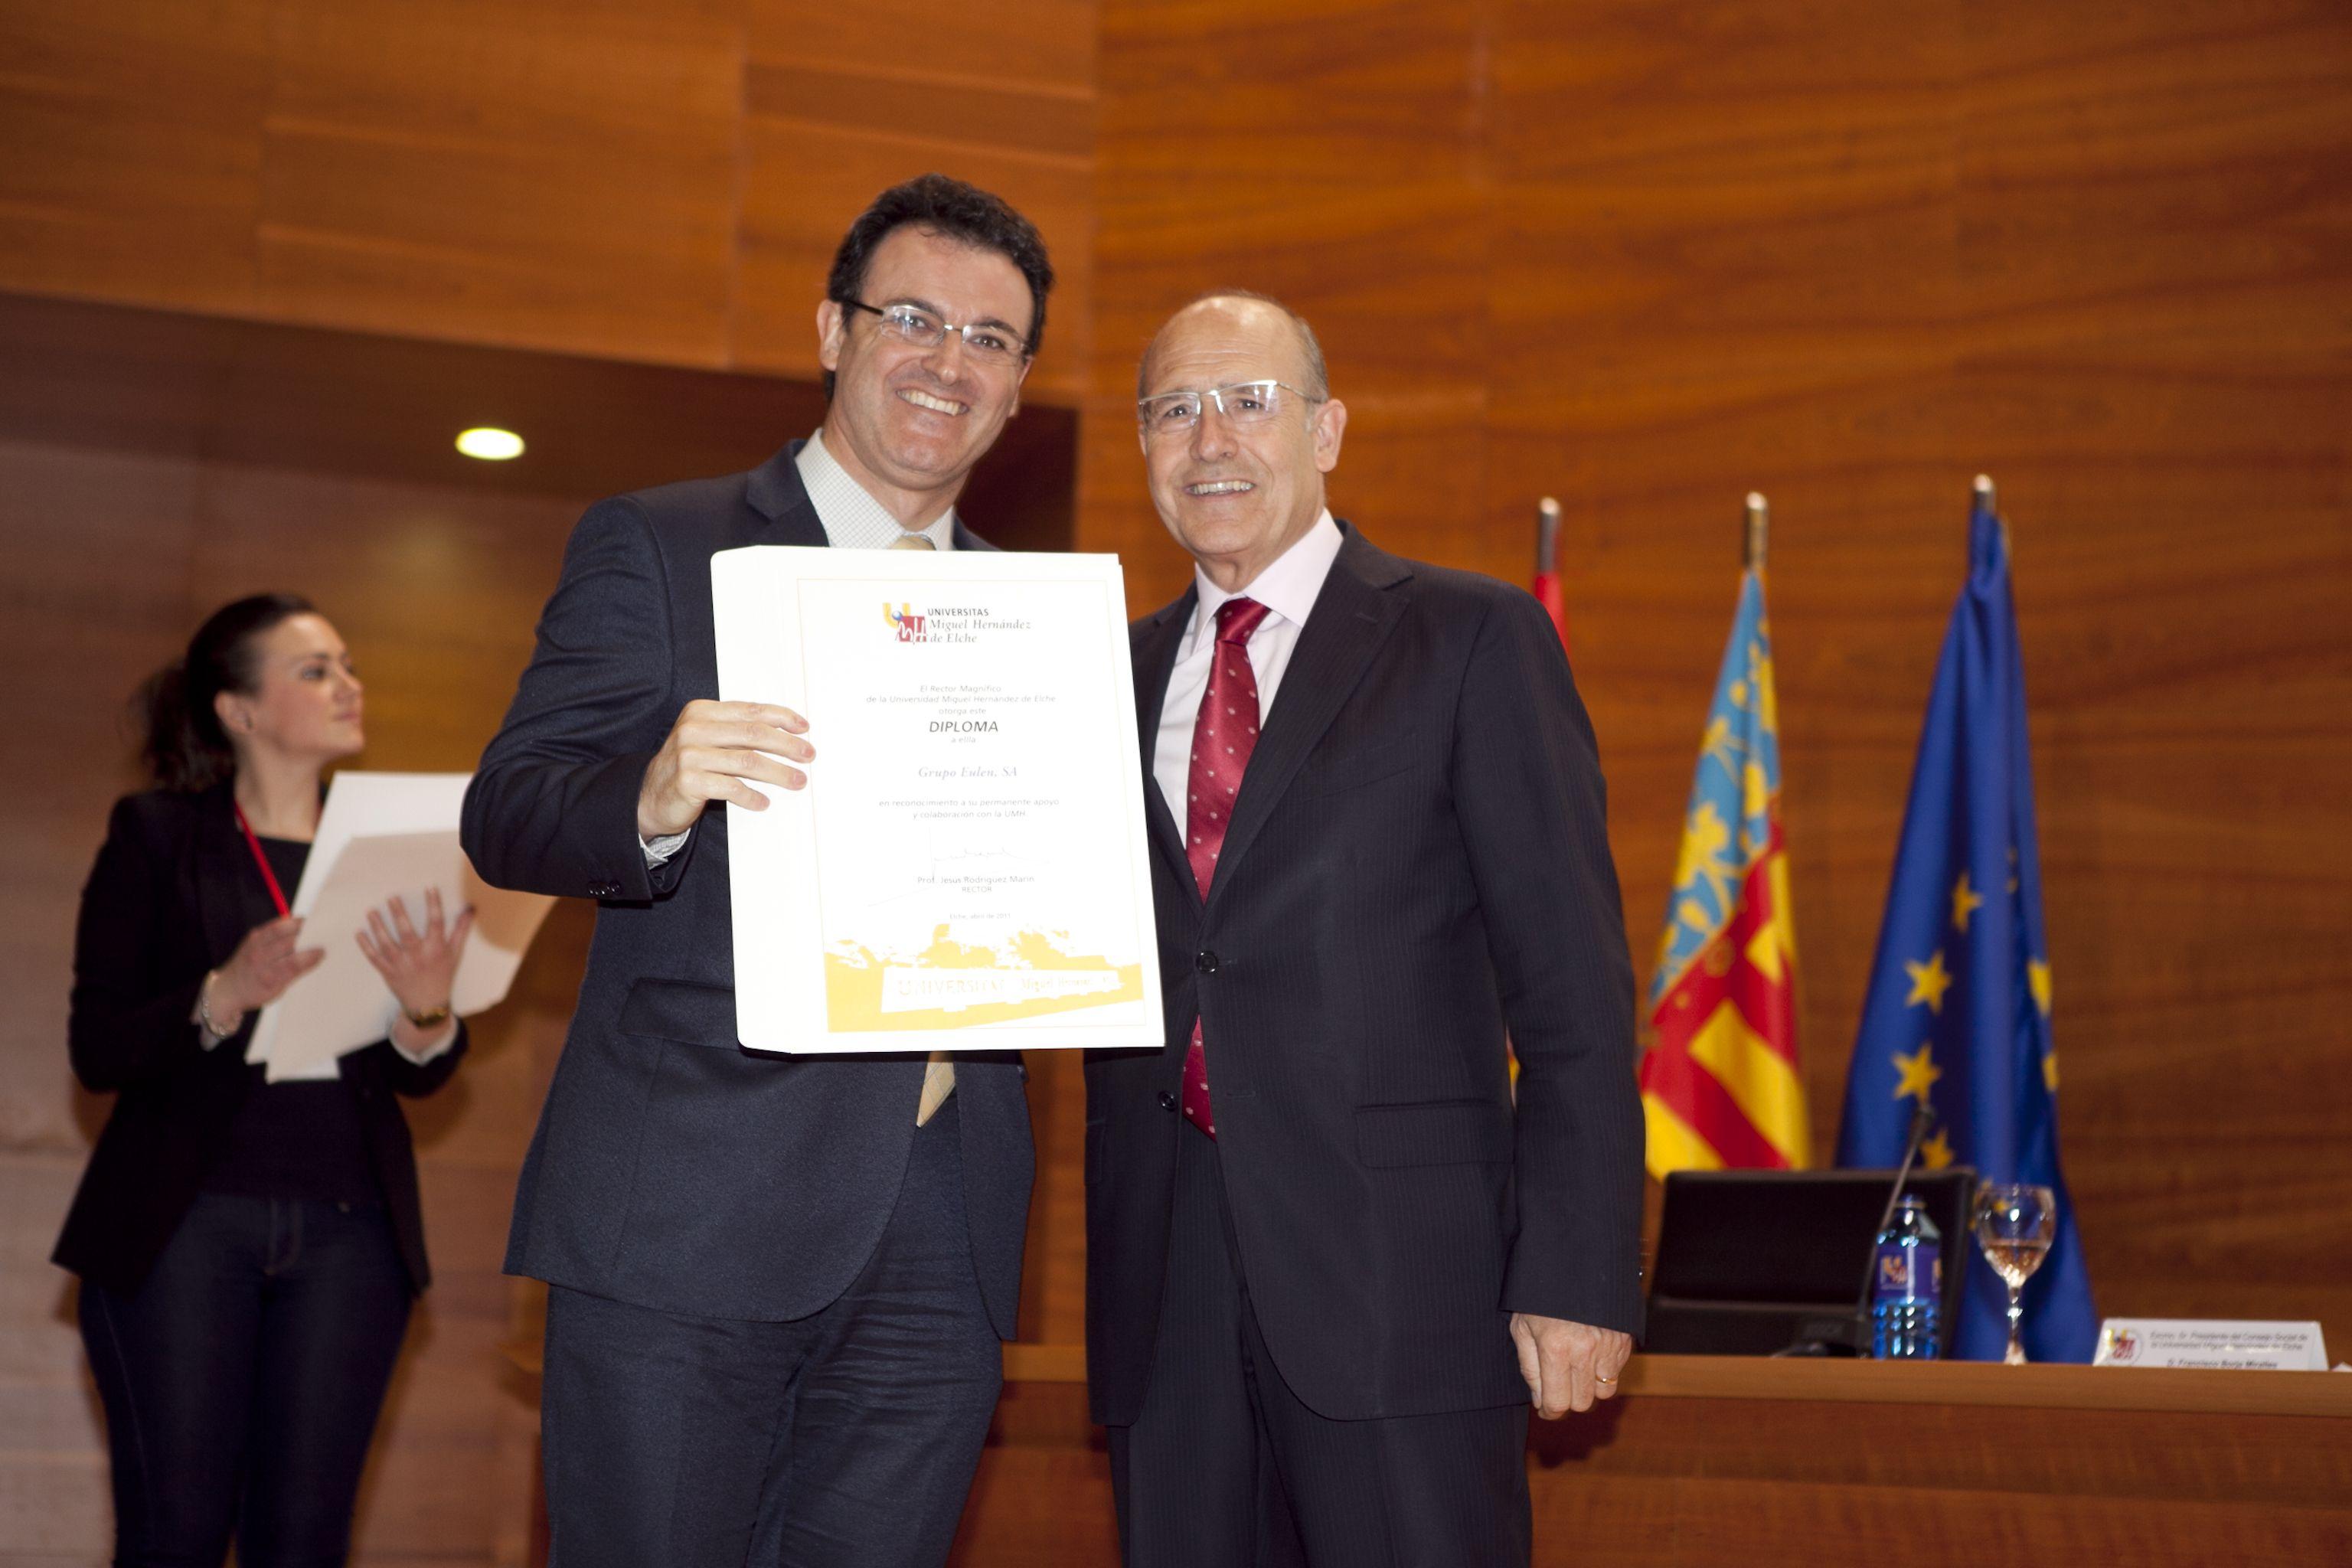 umh-diplomas-rector_mg_6832.jpg